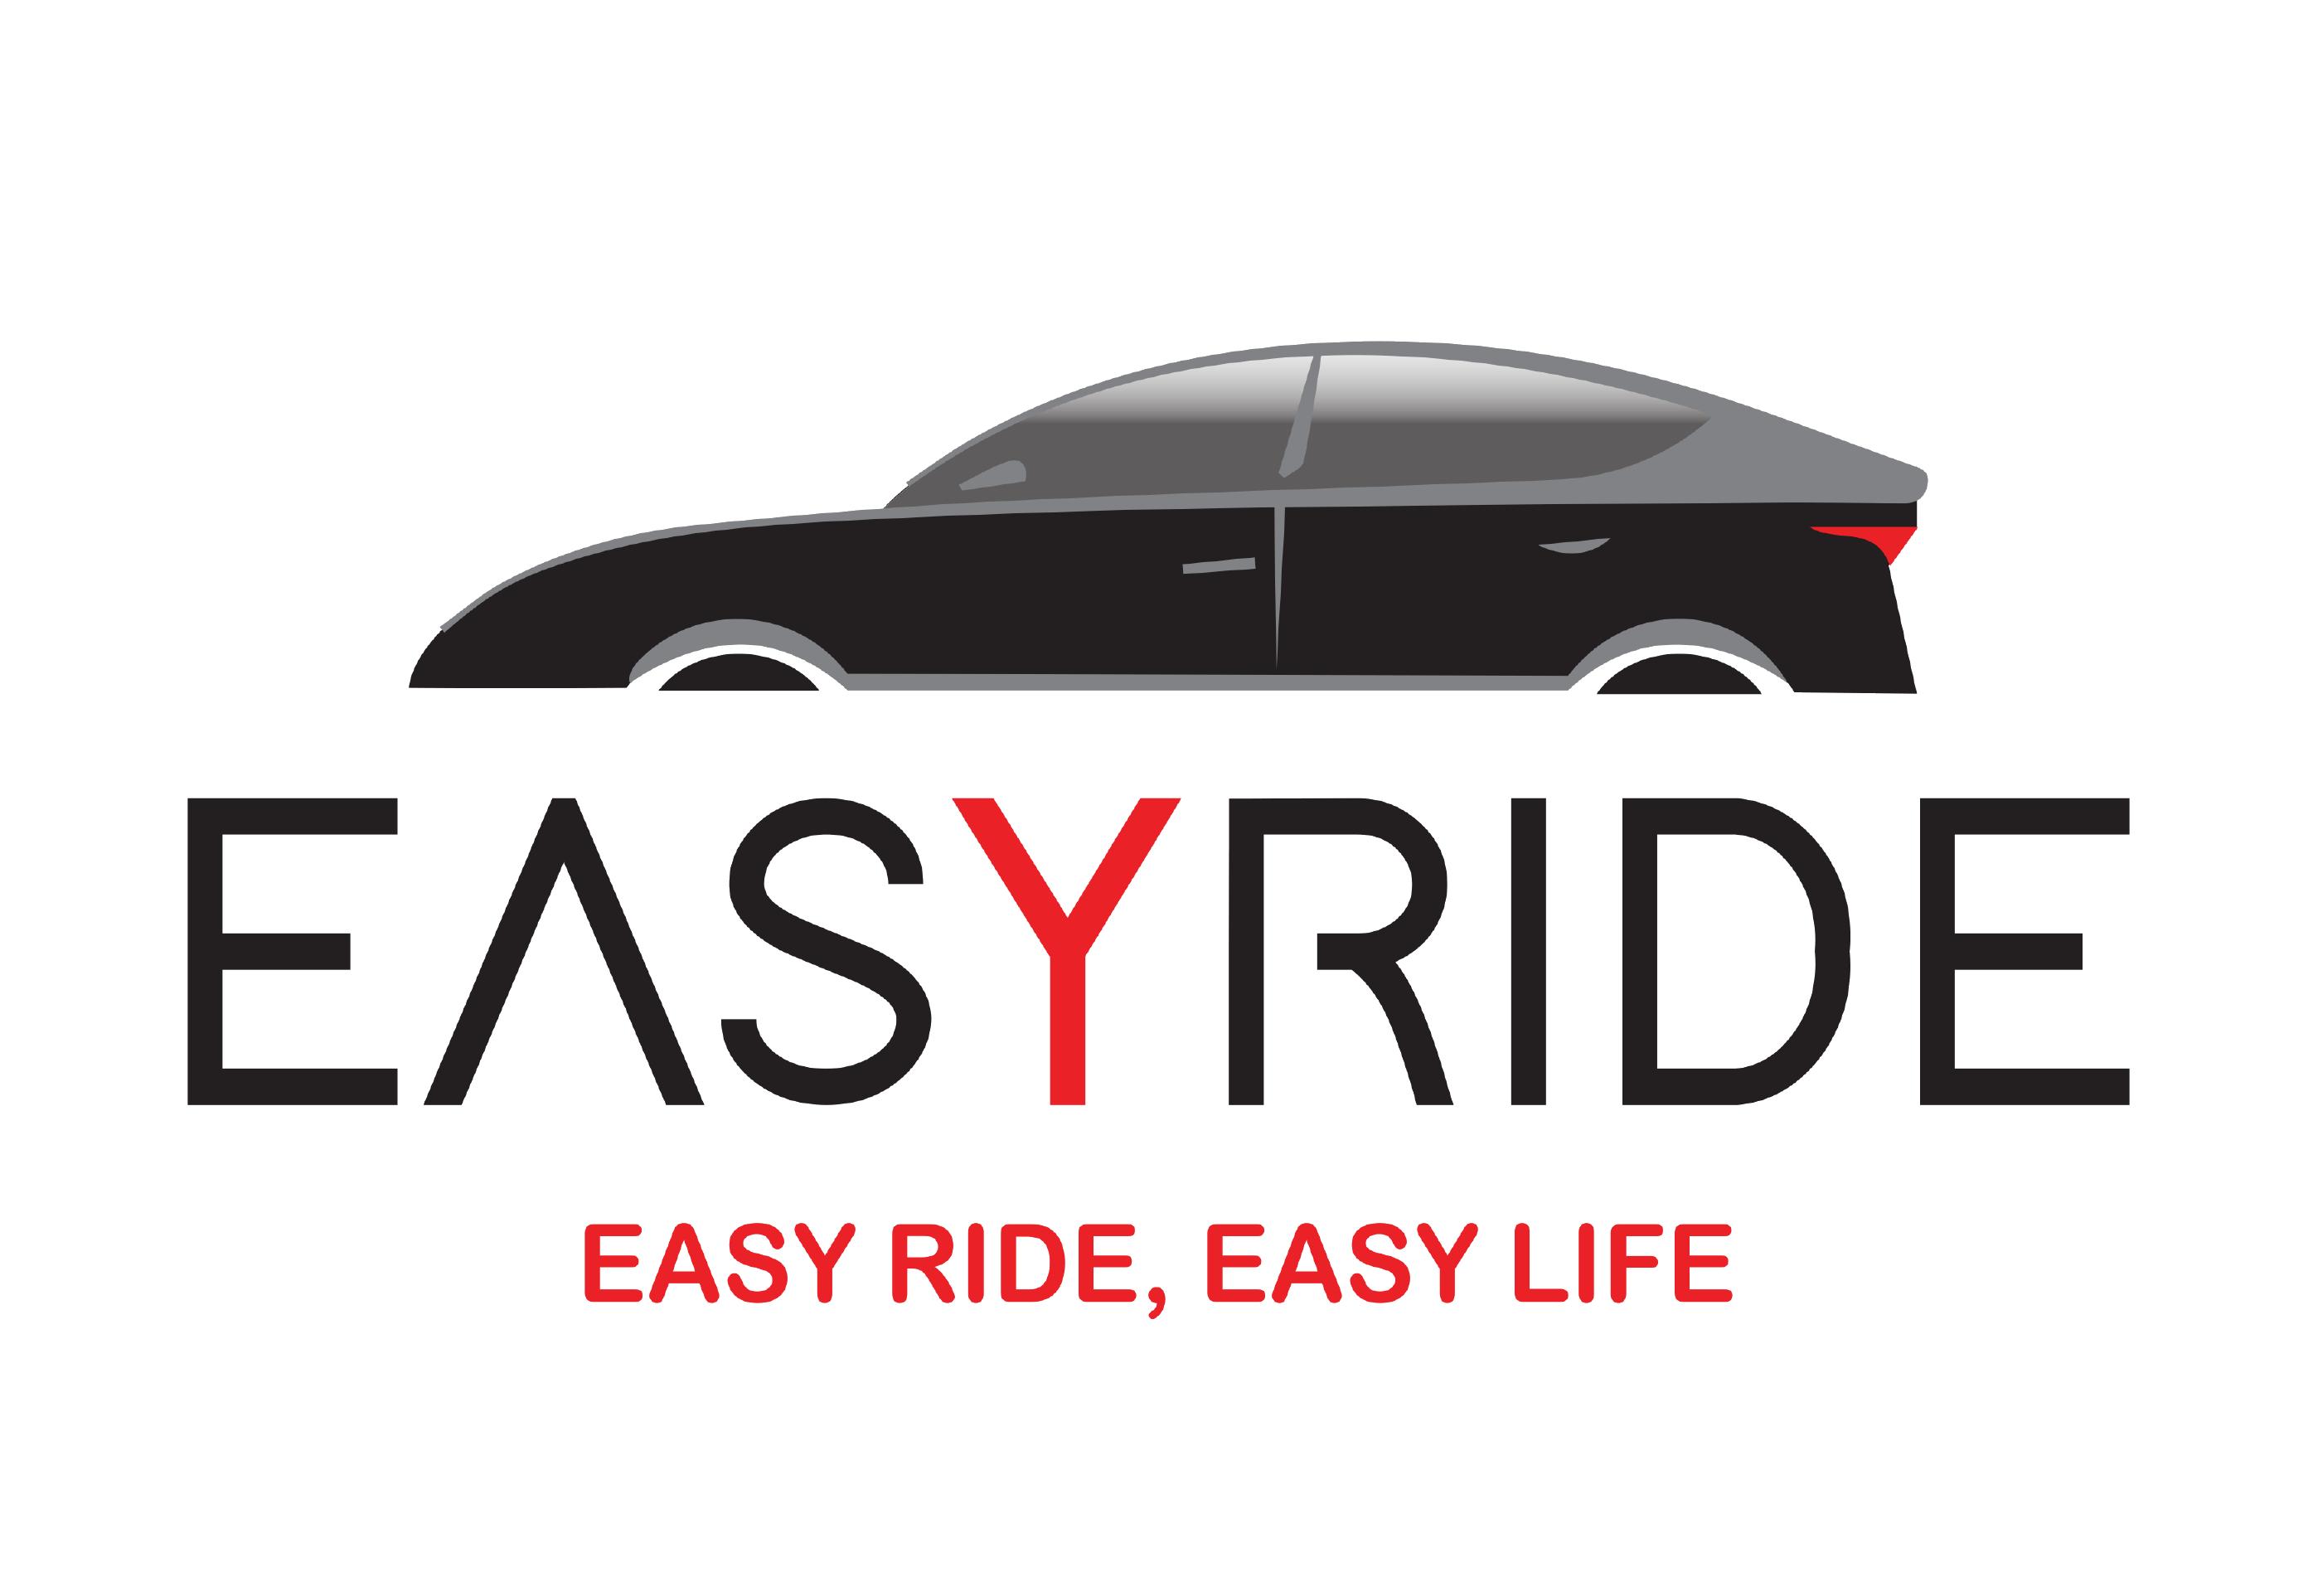 Easyride